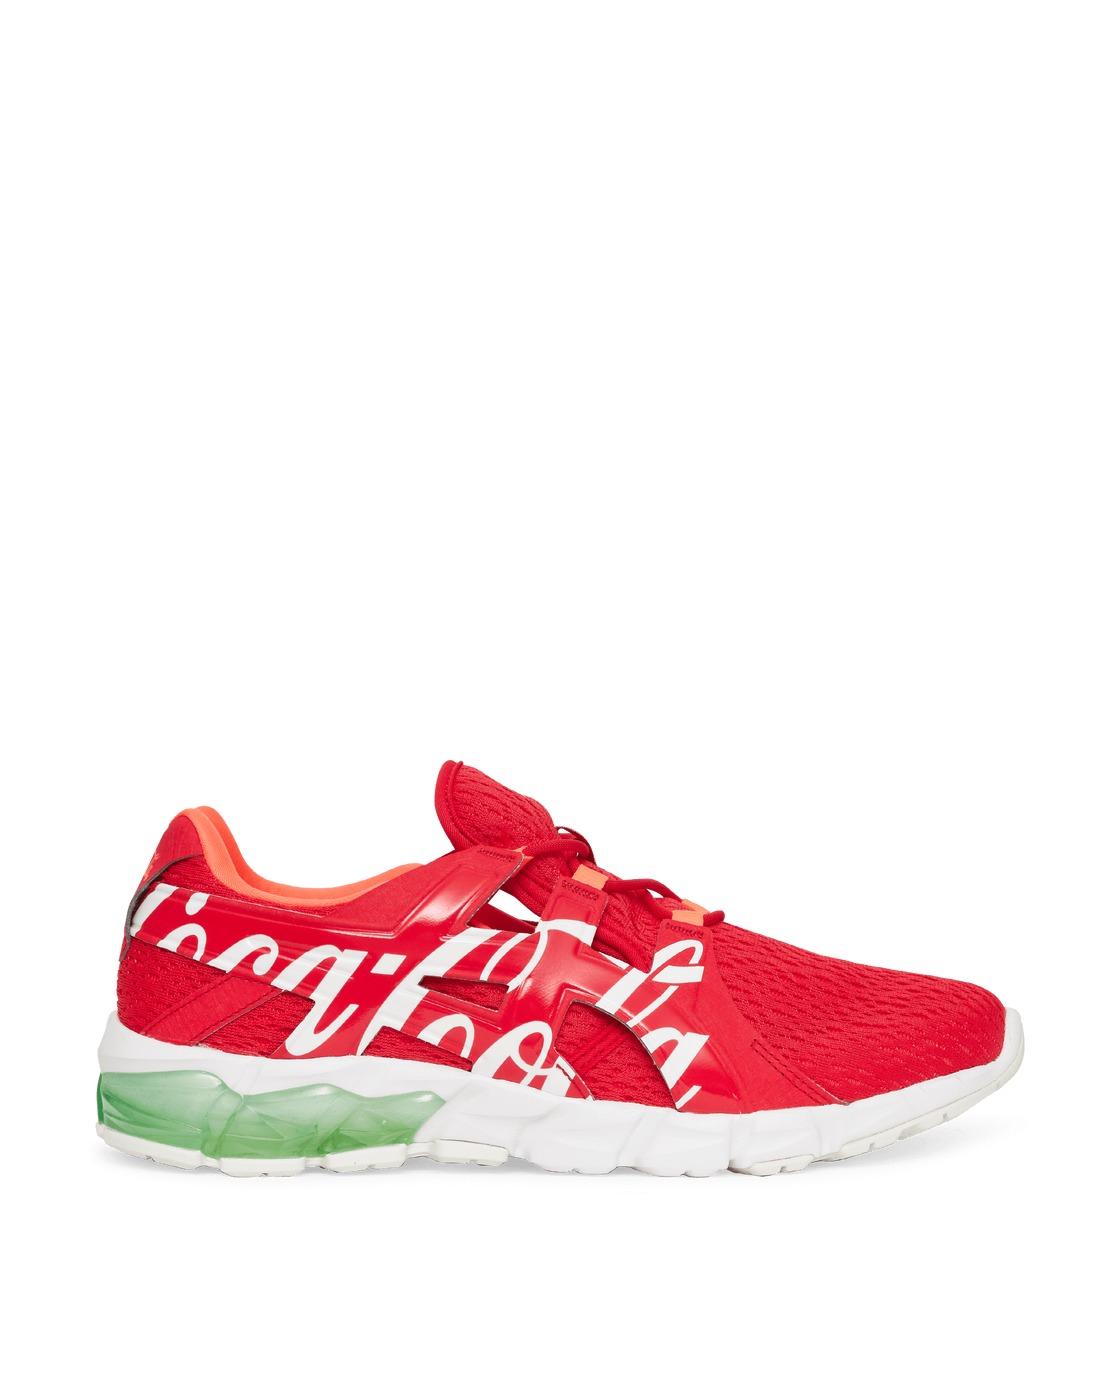 Photo: Asics Coca Cola Gel Quantum 90 Tyo Sneakers Coke Red/White